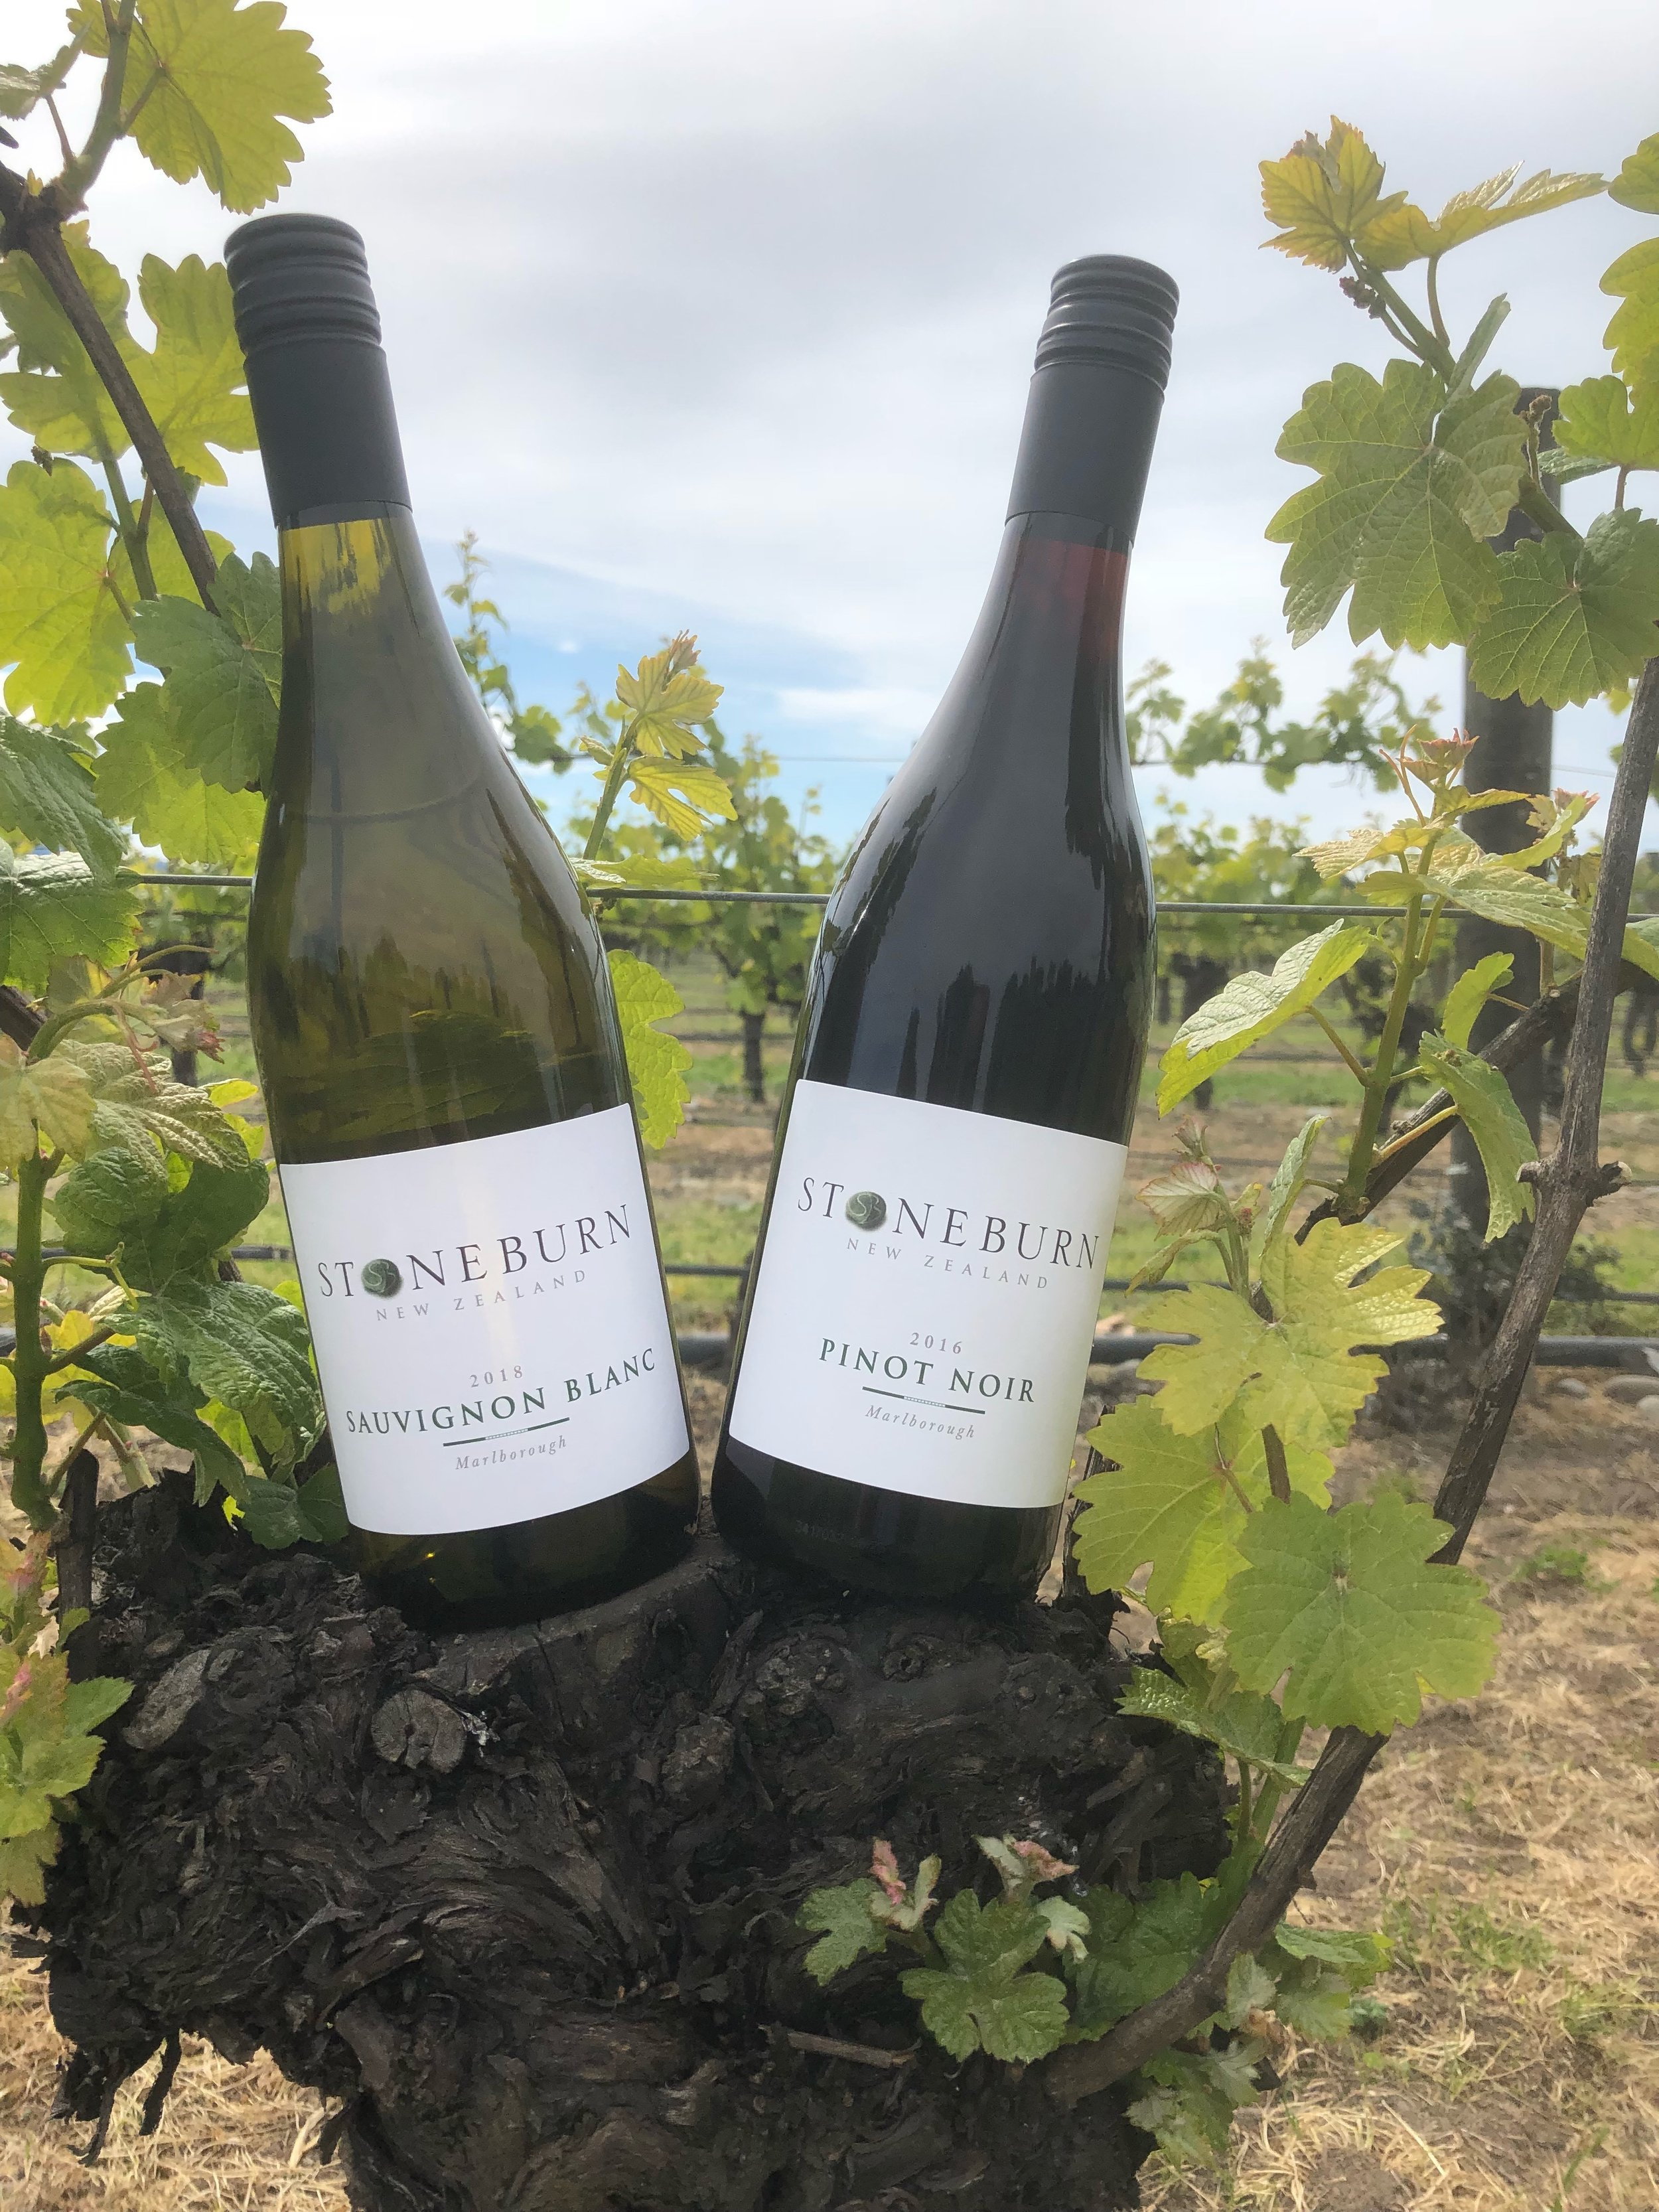 Stoneburn Vines.jpg